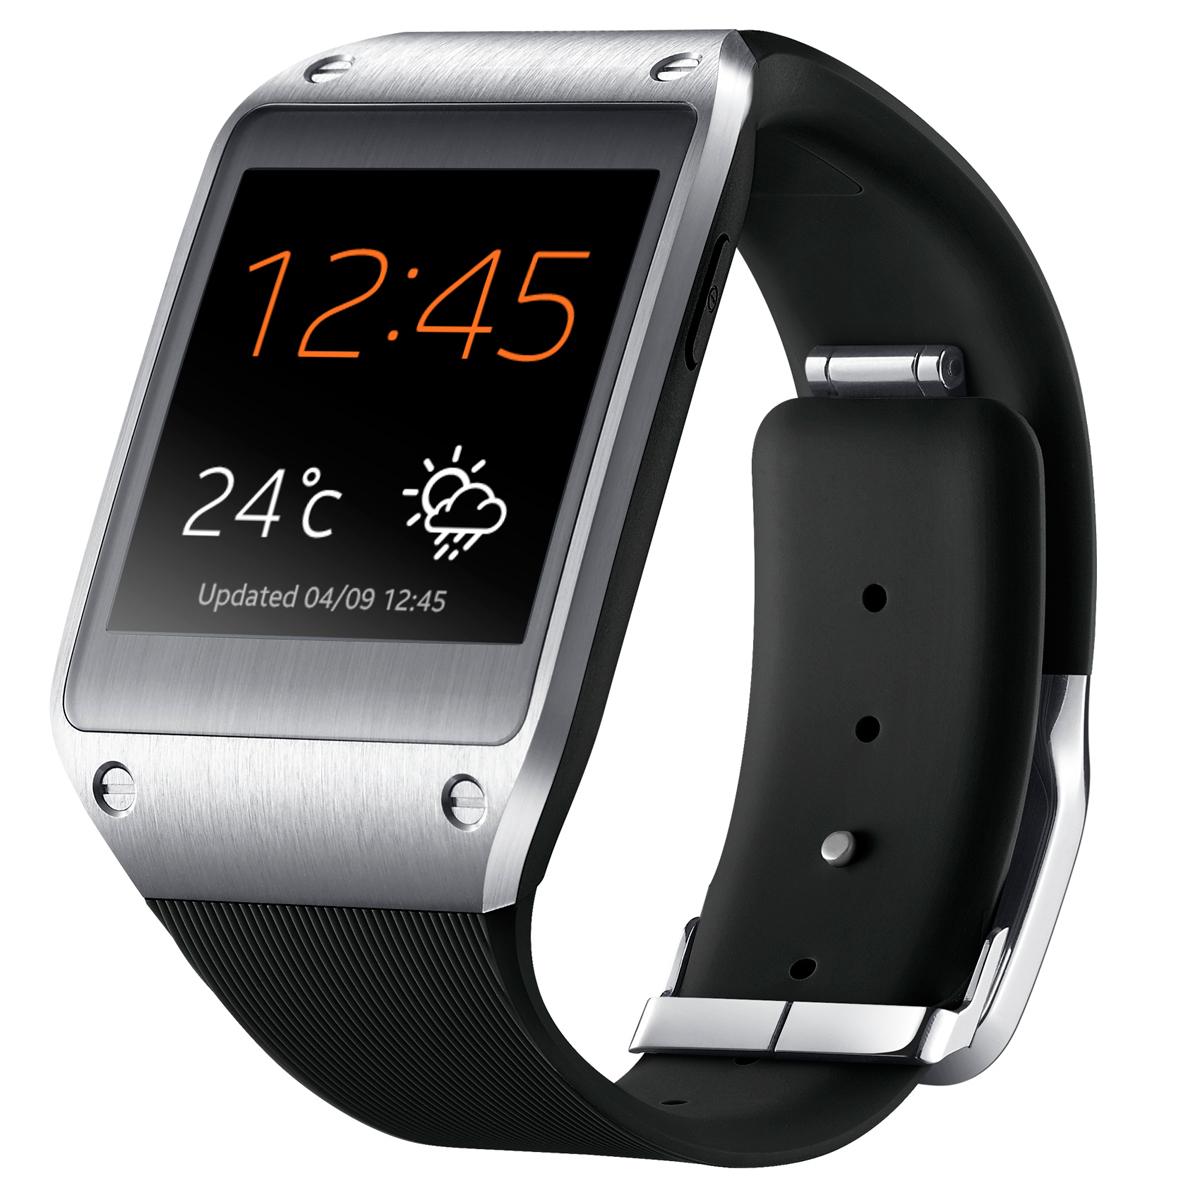 Montre connectée Samsung Galaxy Gear  ( ODR de 100€)  à 89.99€ via Buyster, sinon